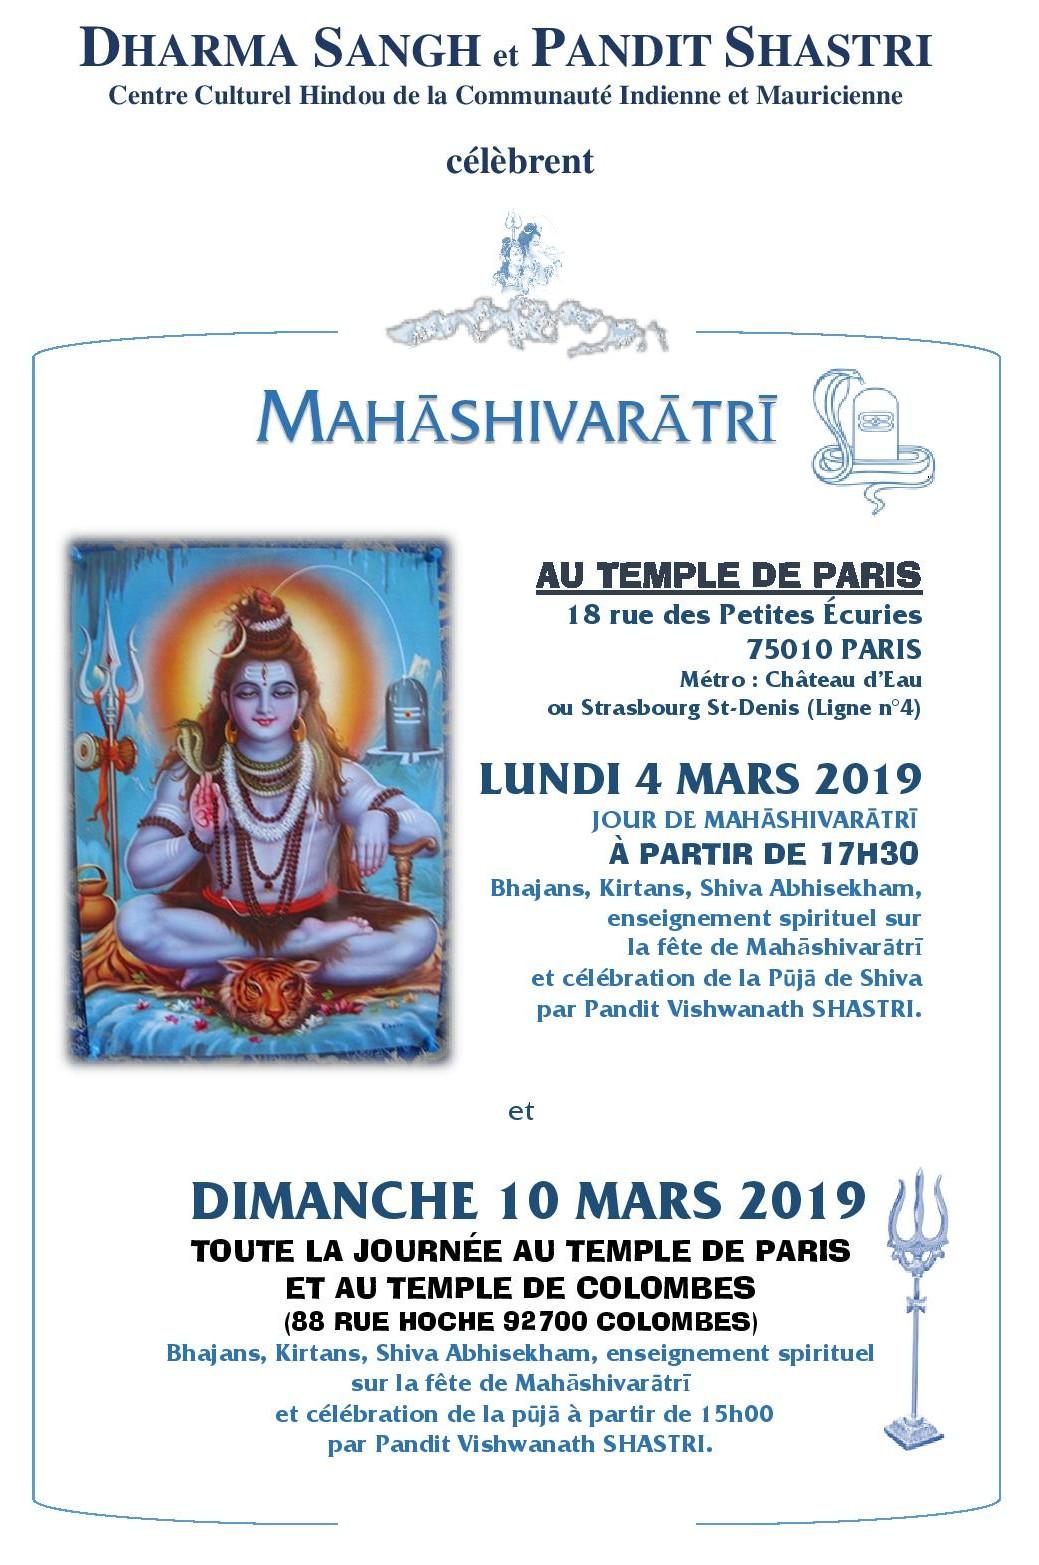 AFFICHE DE MAHA SHIVARATRI 2019-page-001